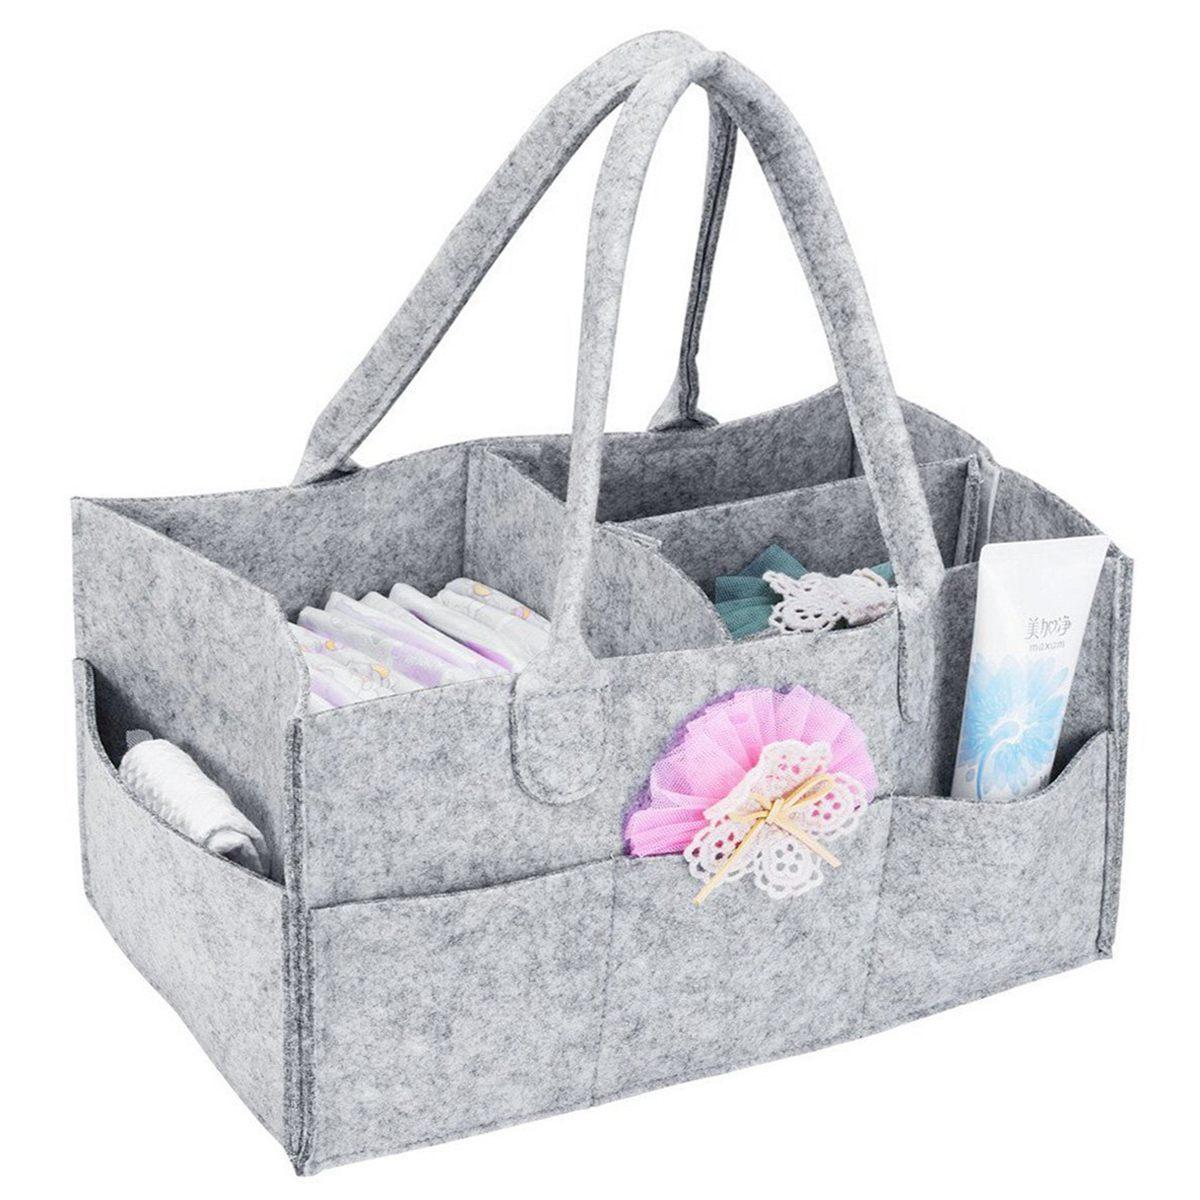 Mummy Bag Nursery Storage Bin-Baby Diaper Caddy-Nursery Wipes Handbag Portable Basket Nappy Organizer